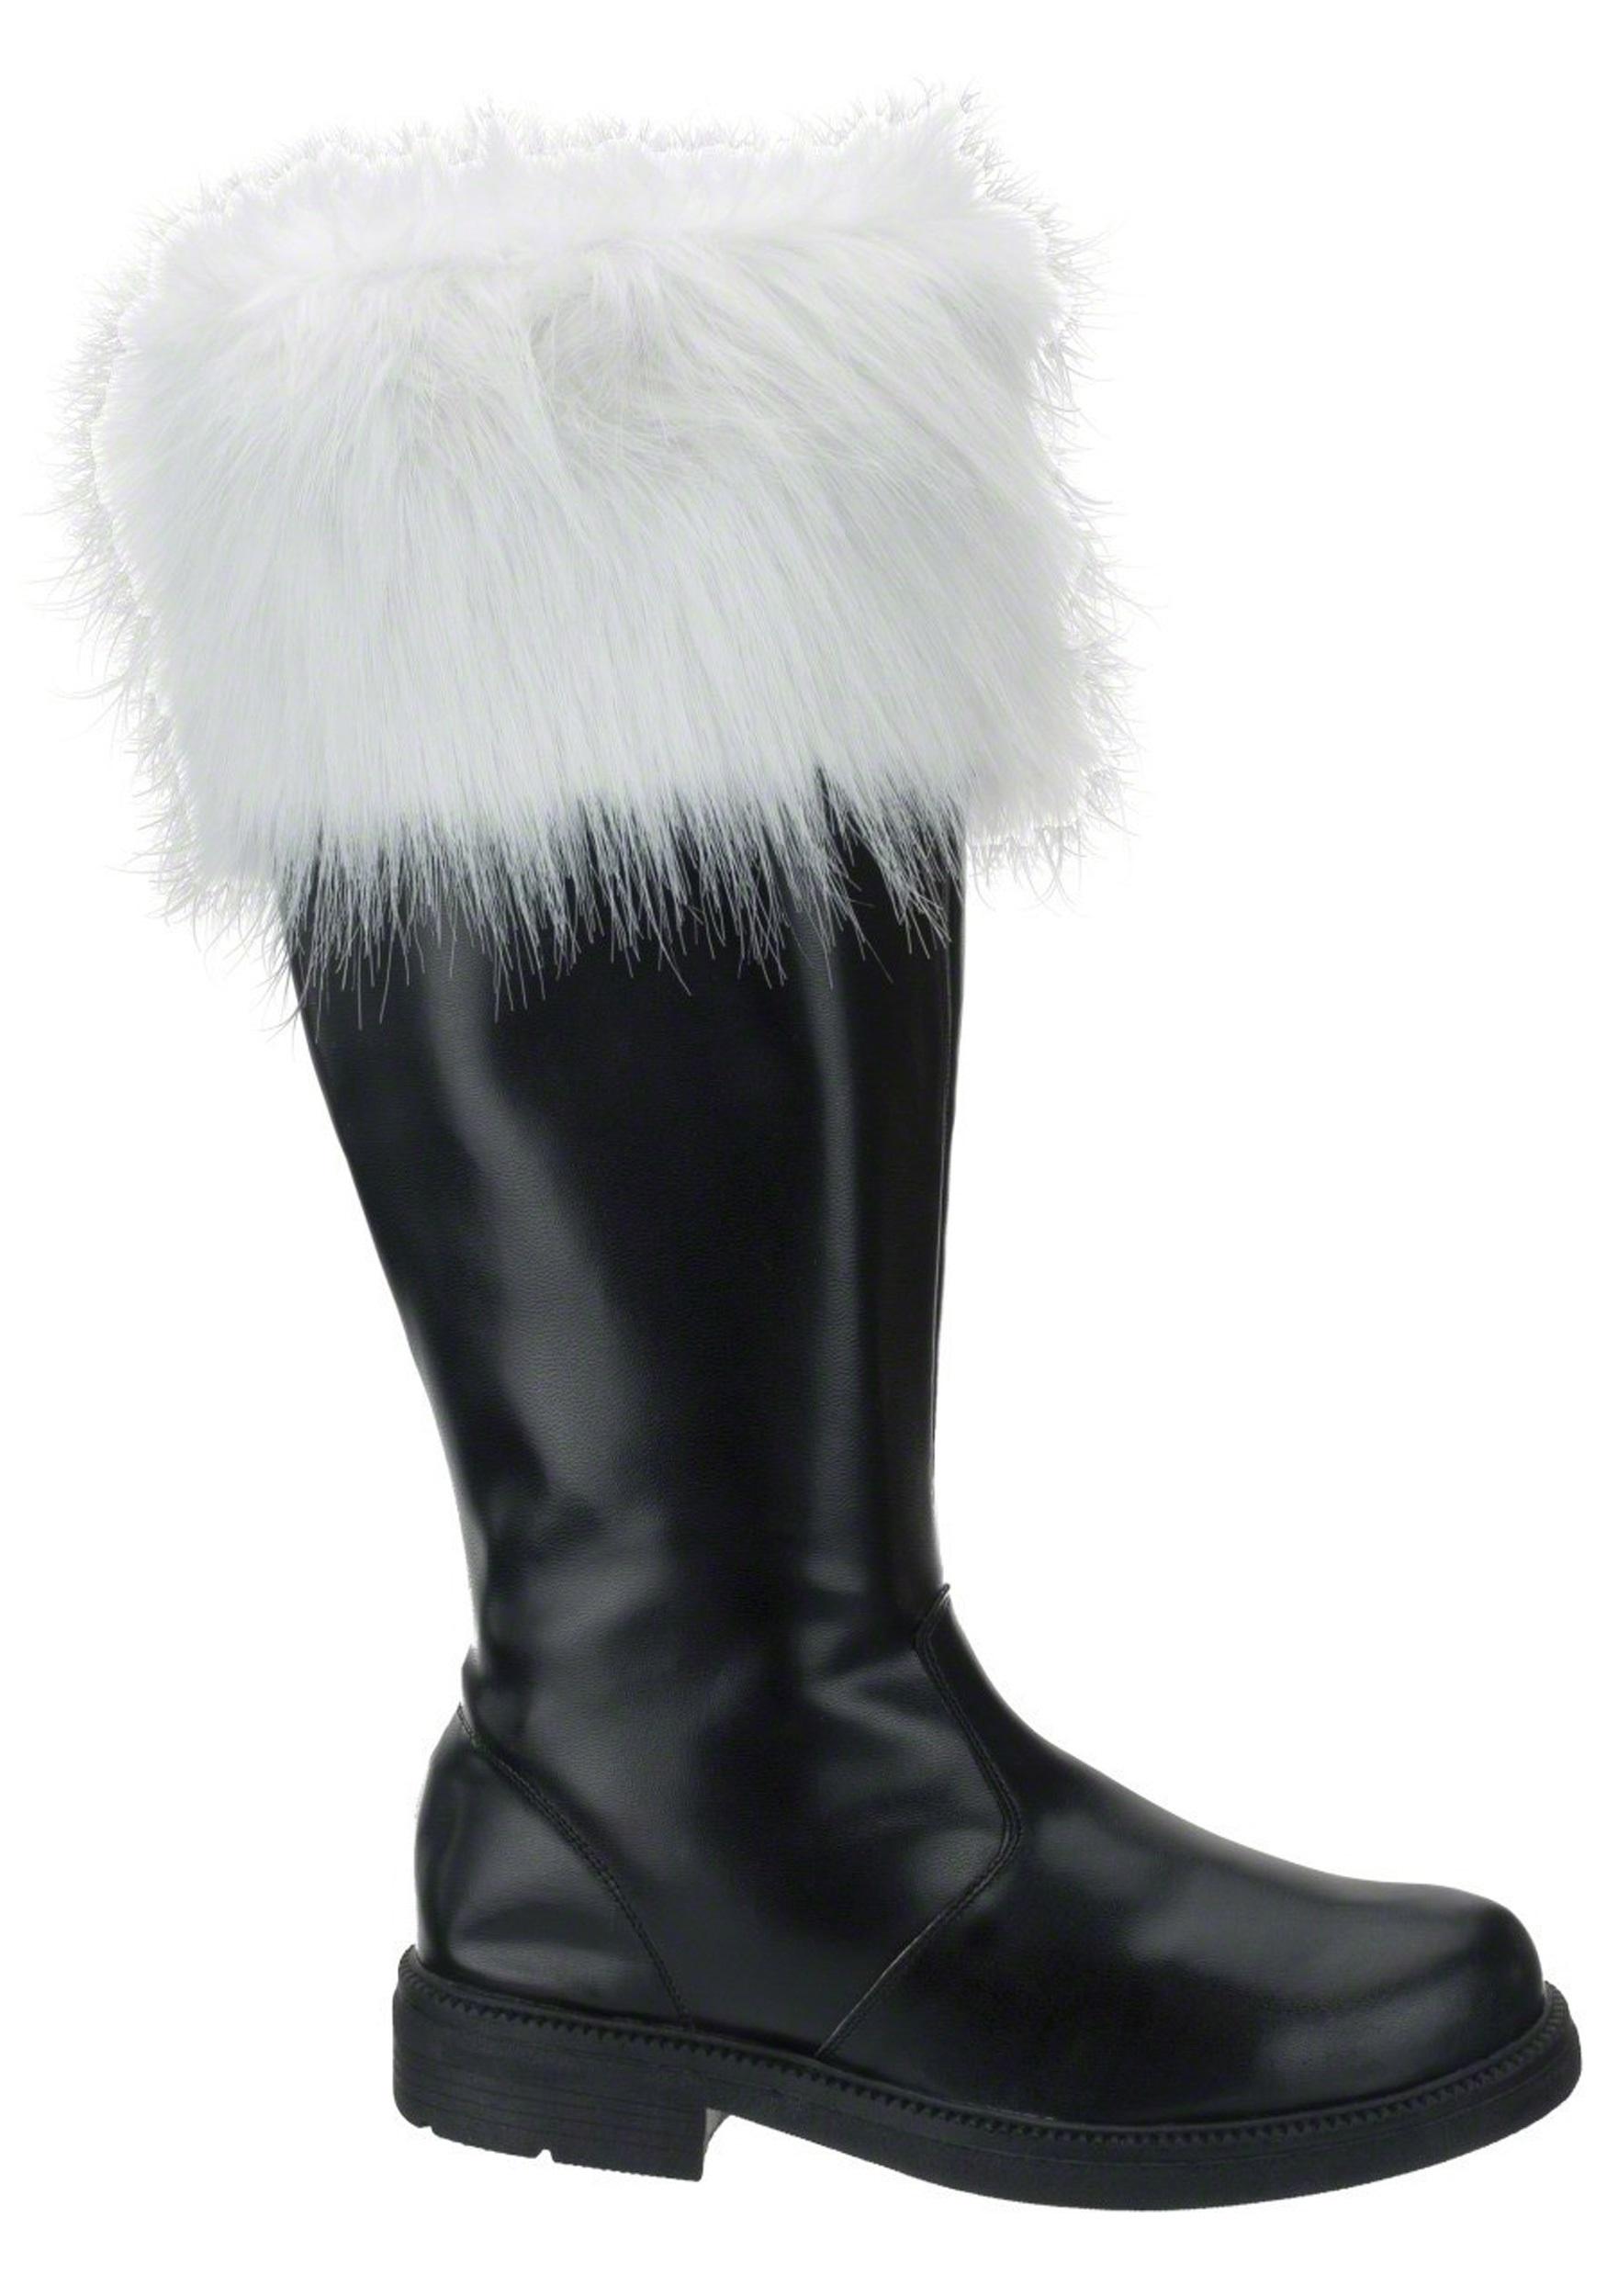 Santa Claus Boots